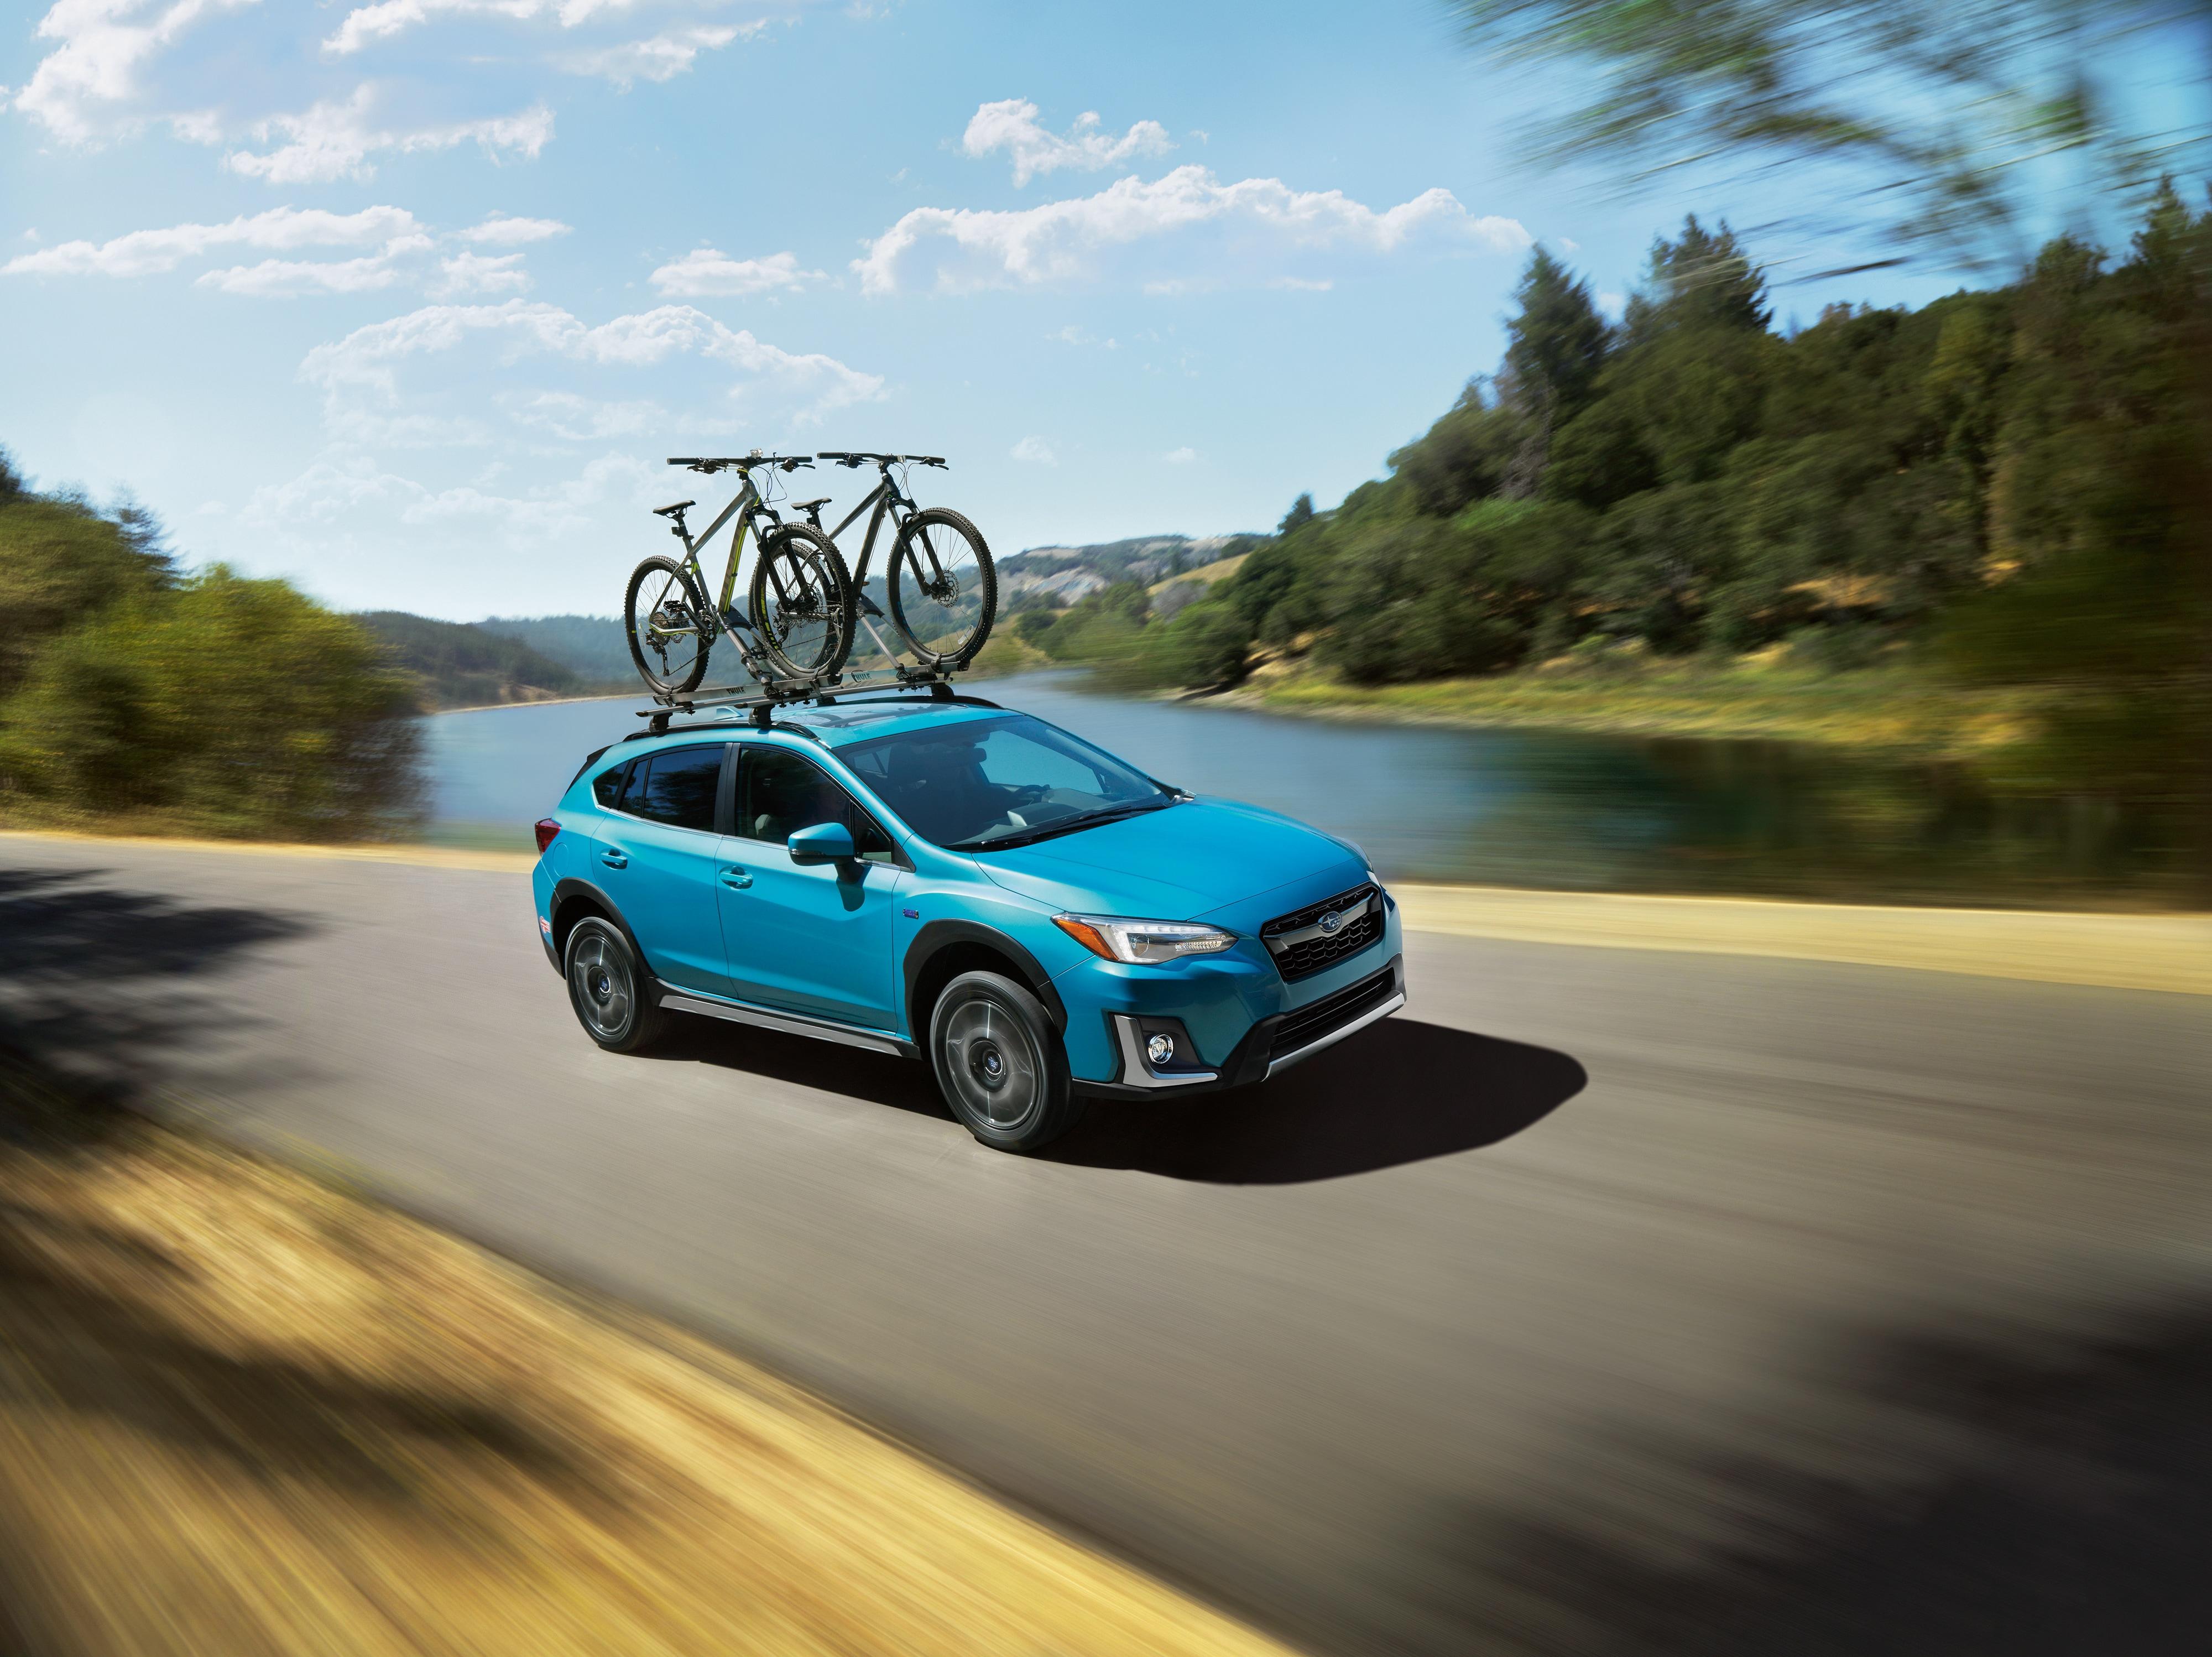 Subaru Ann Arbor >> The Efficient And Adventurous Subaru Crosstrek Hybrid Will Arrive